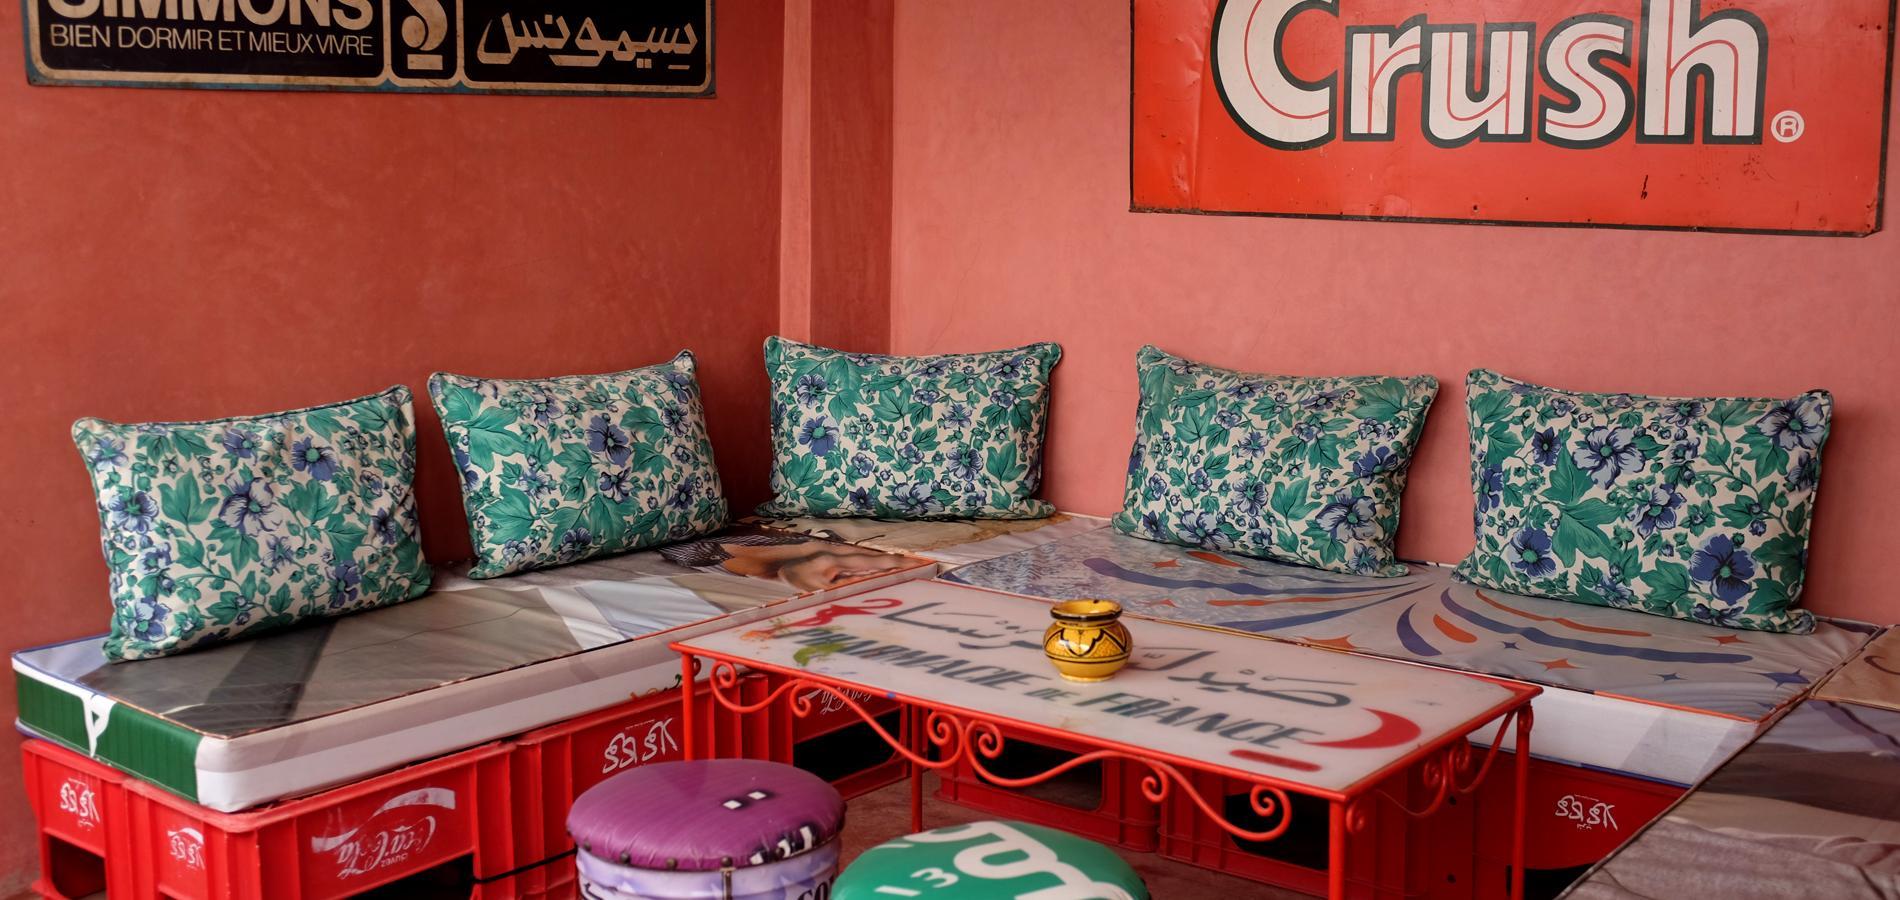 Comment Fabriquer Un Sedari Marocain les belles adresses cachées de marrakech - madame figaro